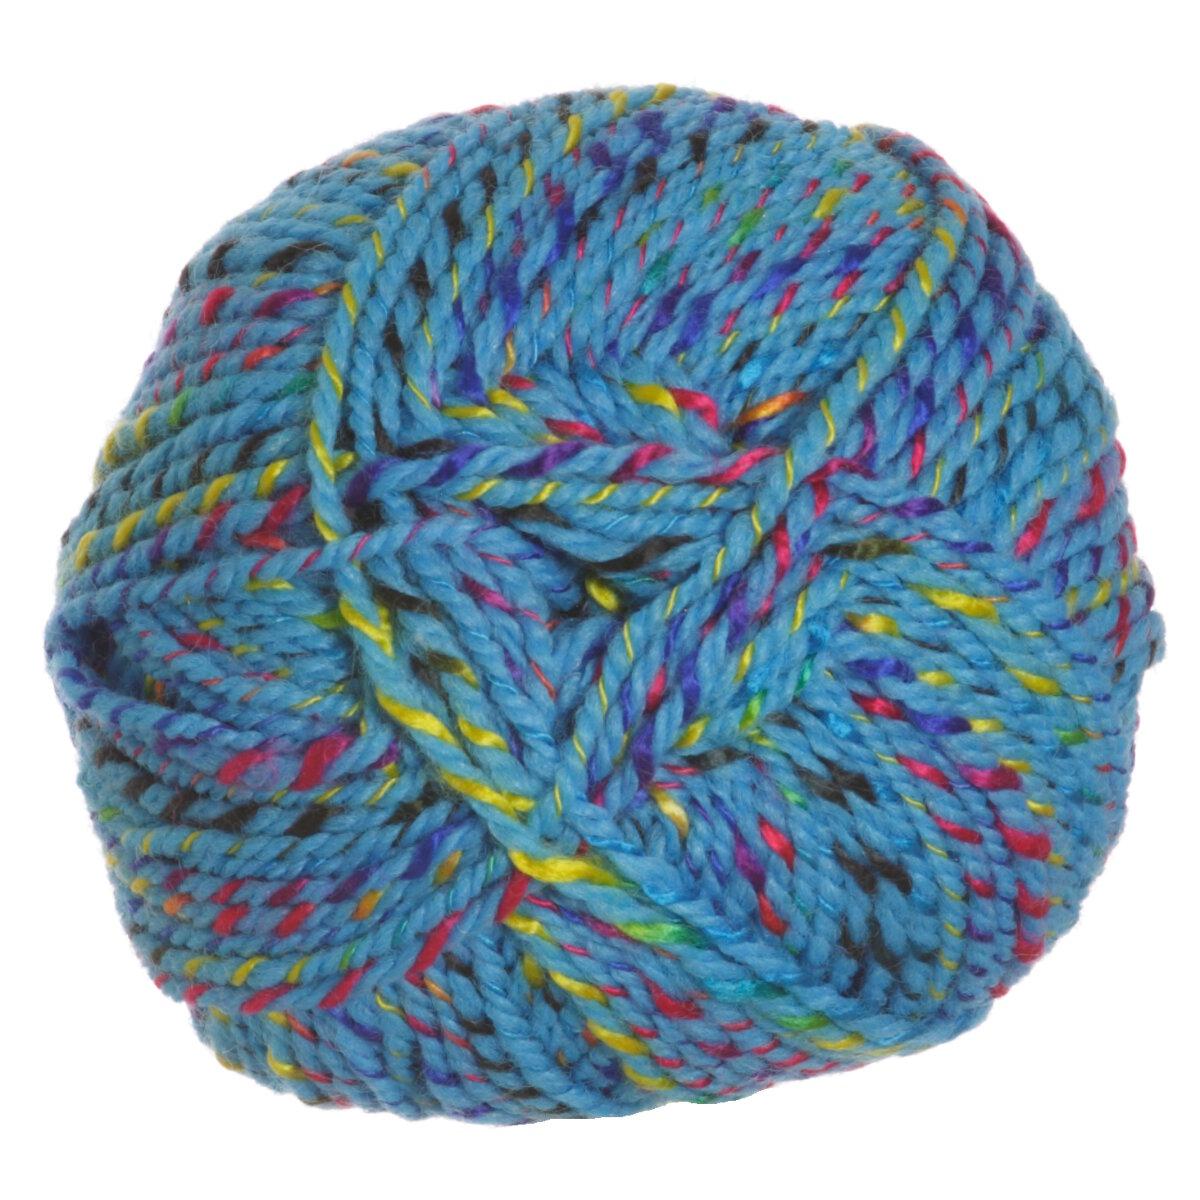 acrylic yarn washing instructions